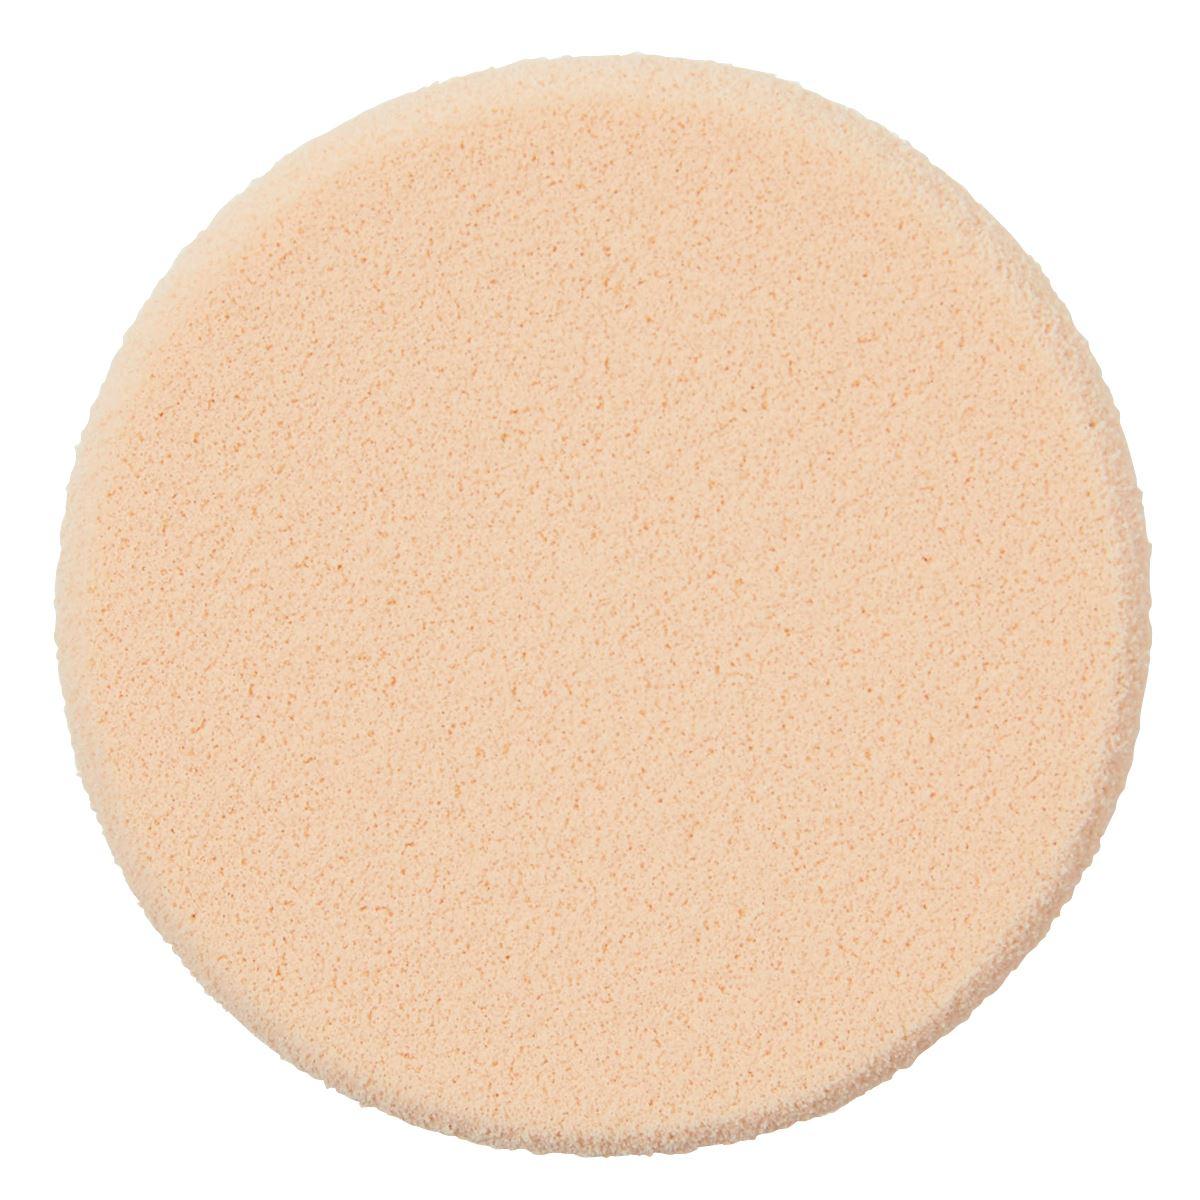 KATE(ケイト)『レアペイントファンデーションN 101 褐色』の使用感をレポに関する画像9